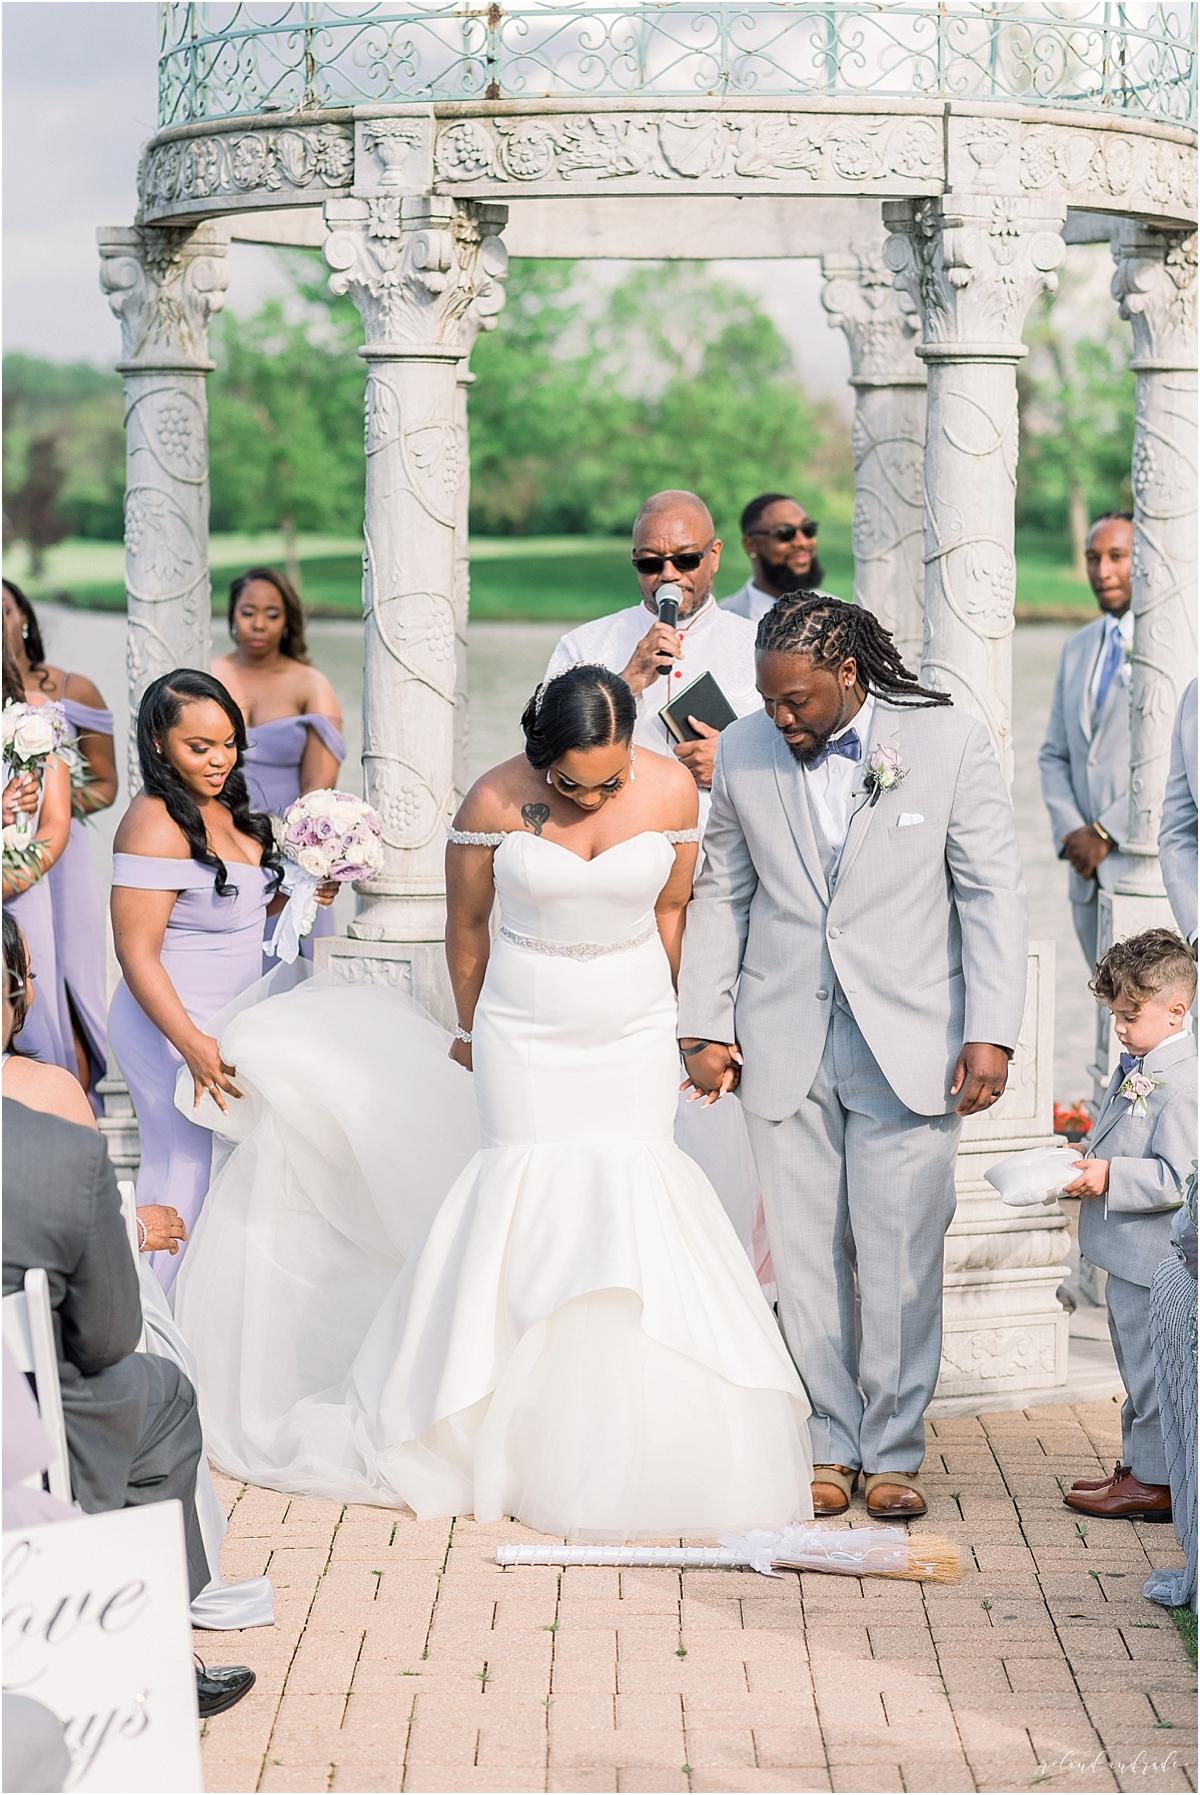 The Odyssey Wedding, Tinley Park Wedding, Chicago Wedding Photographer, Best Photographer In Tineley Park, Best Photographer In Chicago, Light And Airy Photographer_0047.jpg